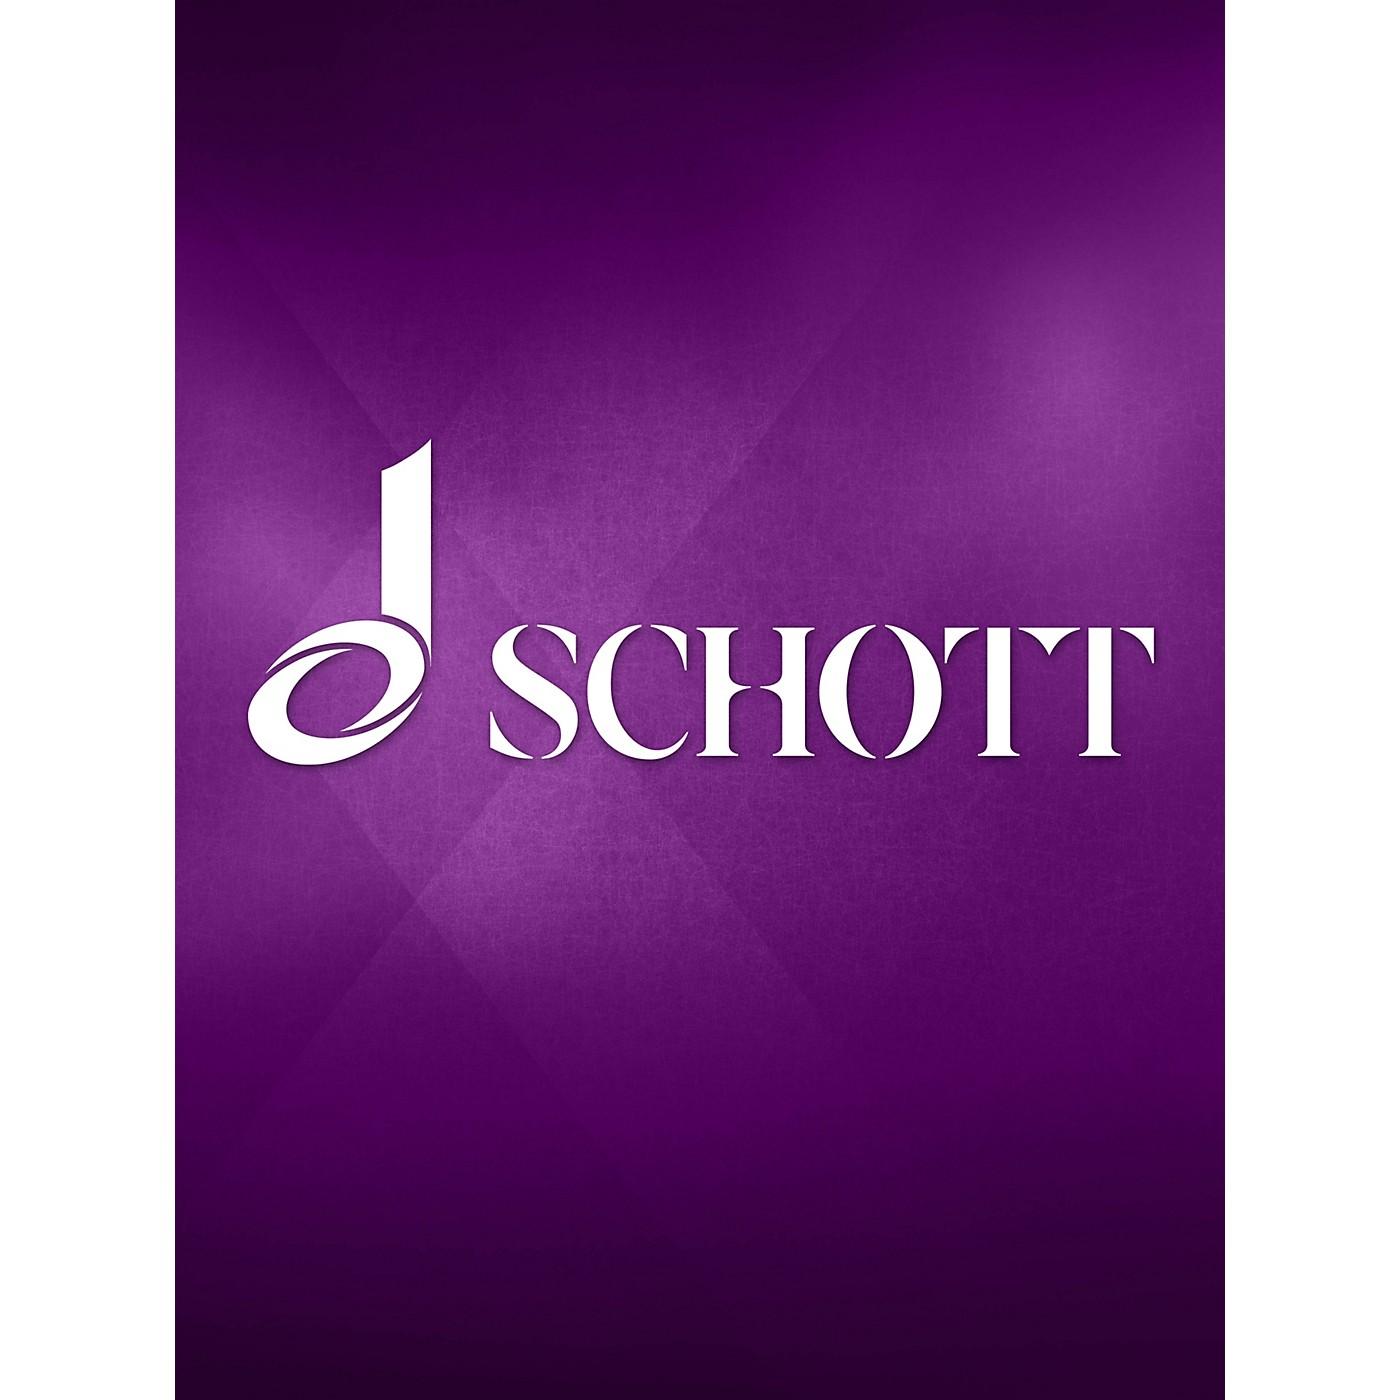 Schott Freres Clavecinistes Italiens du XVIIIe Siécle (for Piano) Schott Series thumbnail